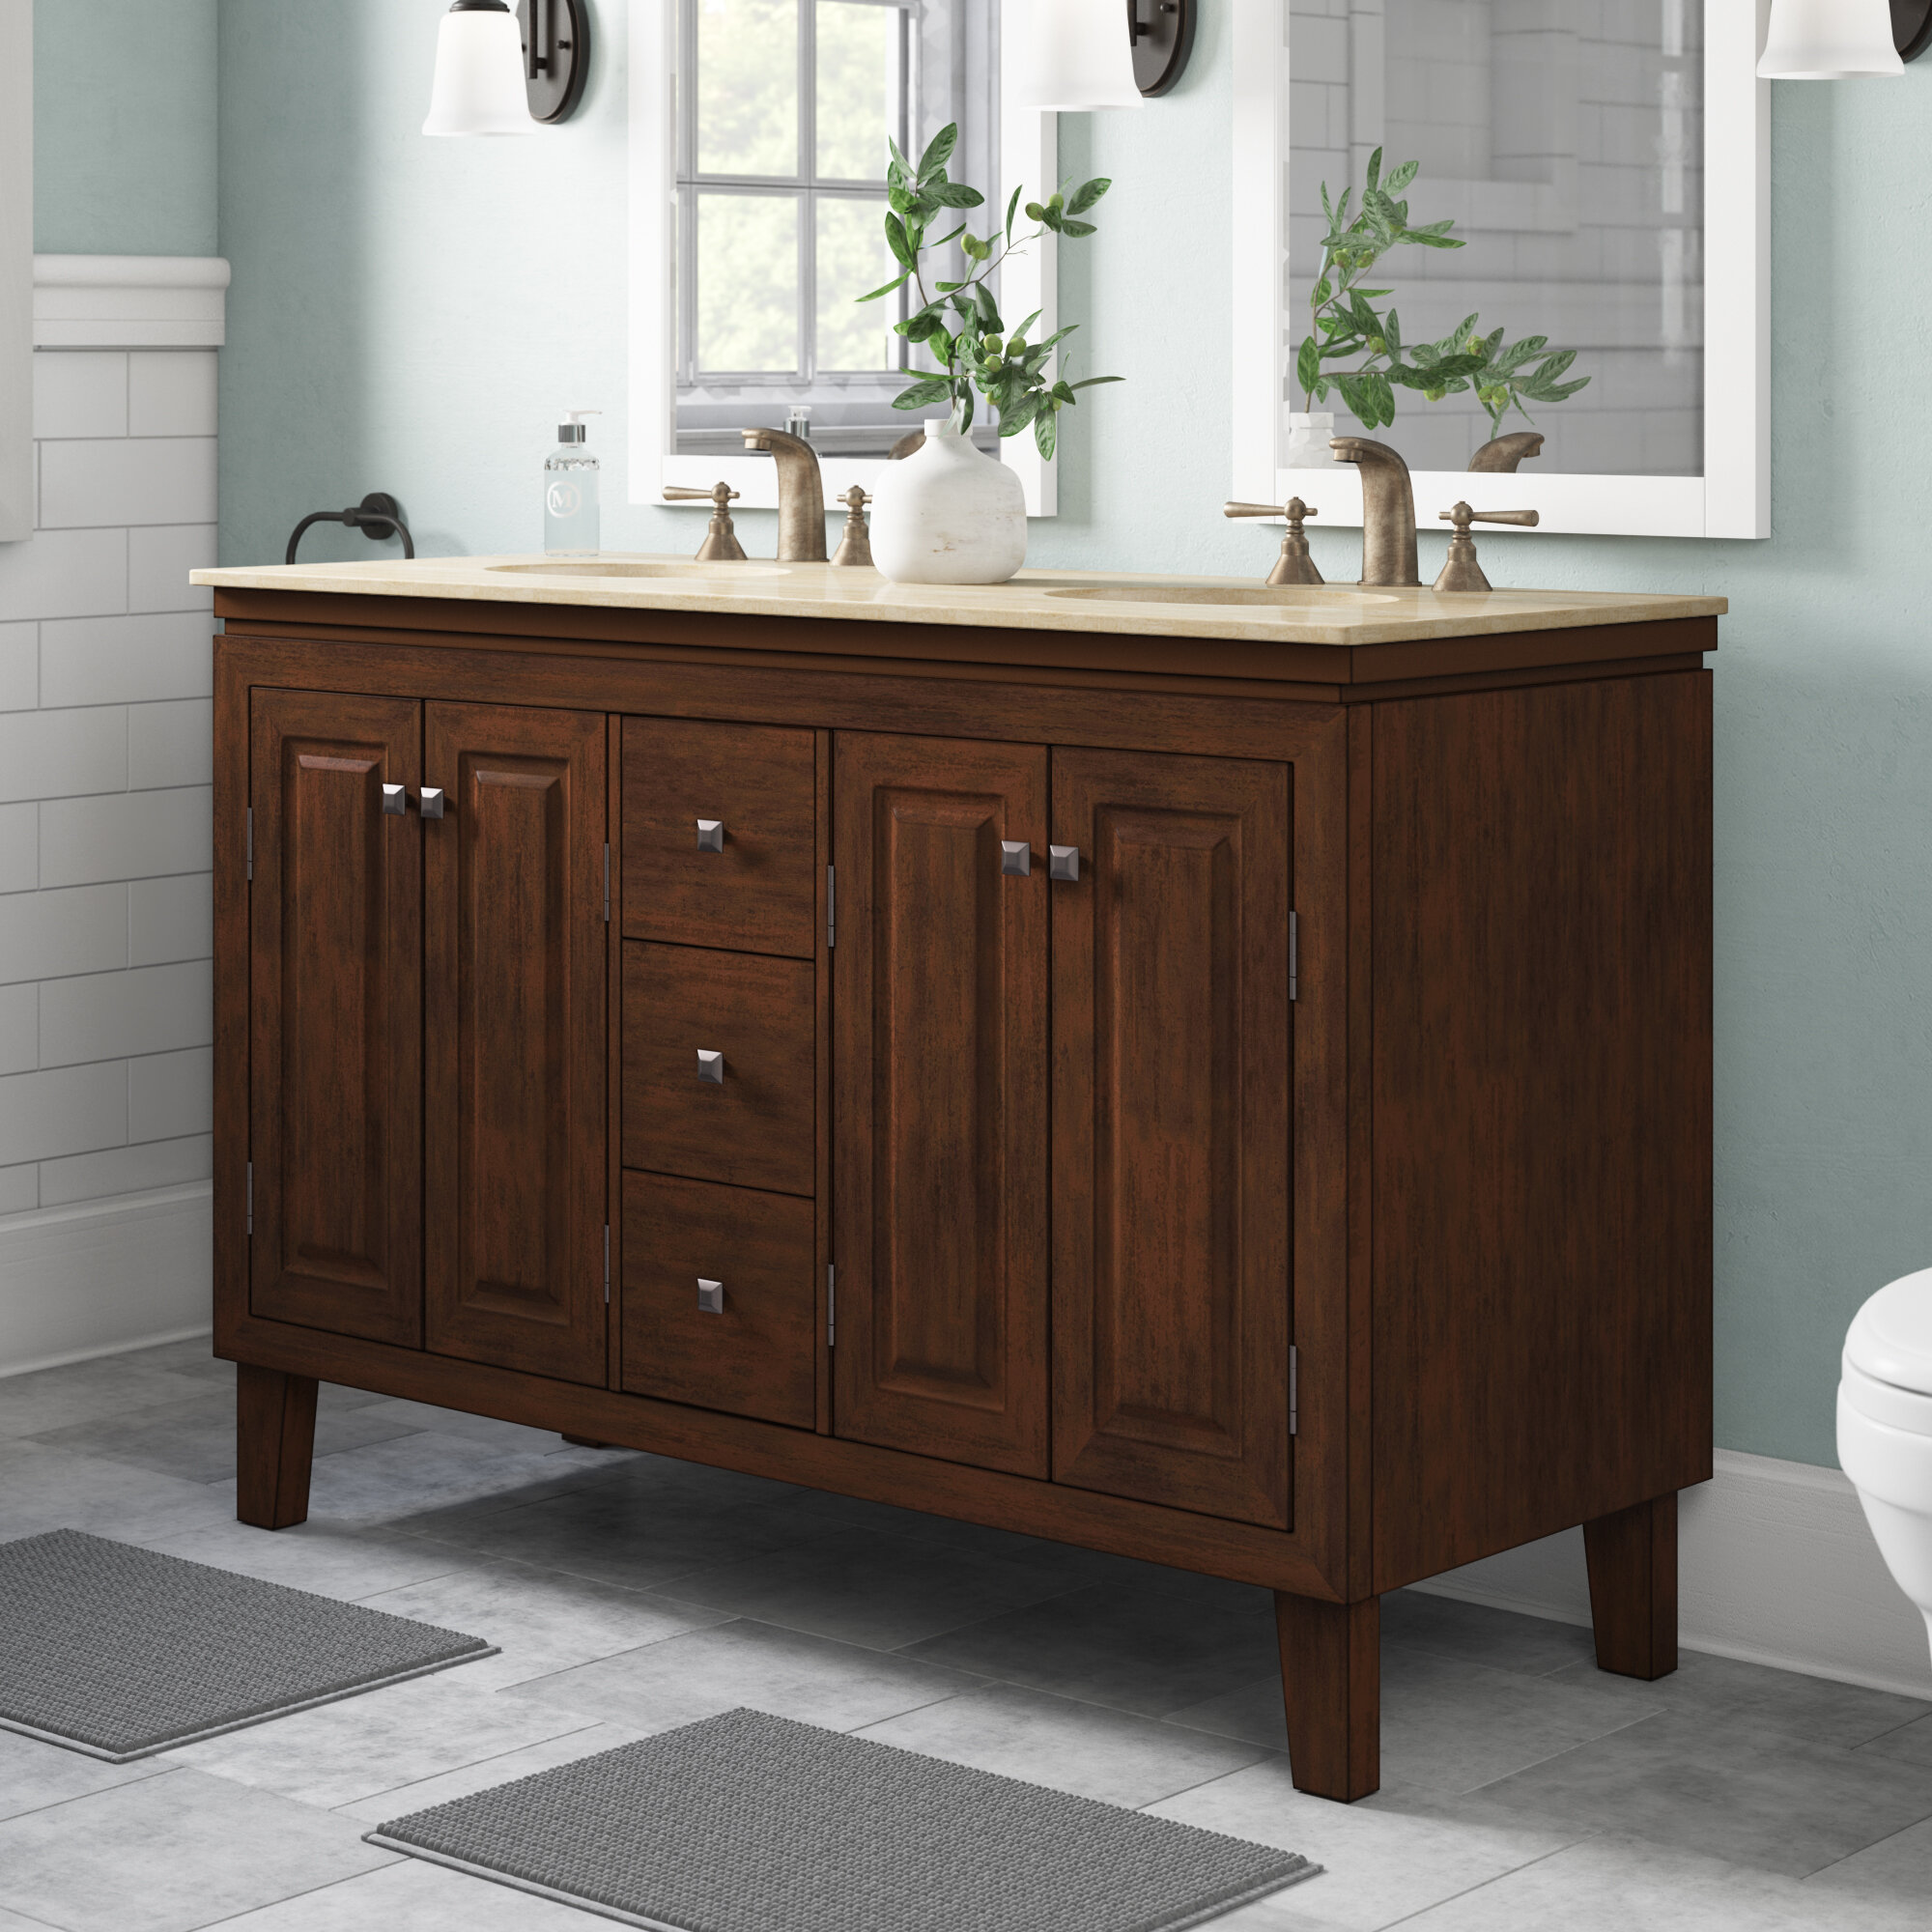 51 55 Bathroom Vanities You Ll Love In 2021 Wayfair